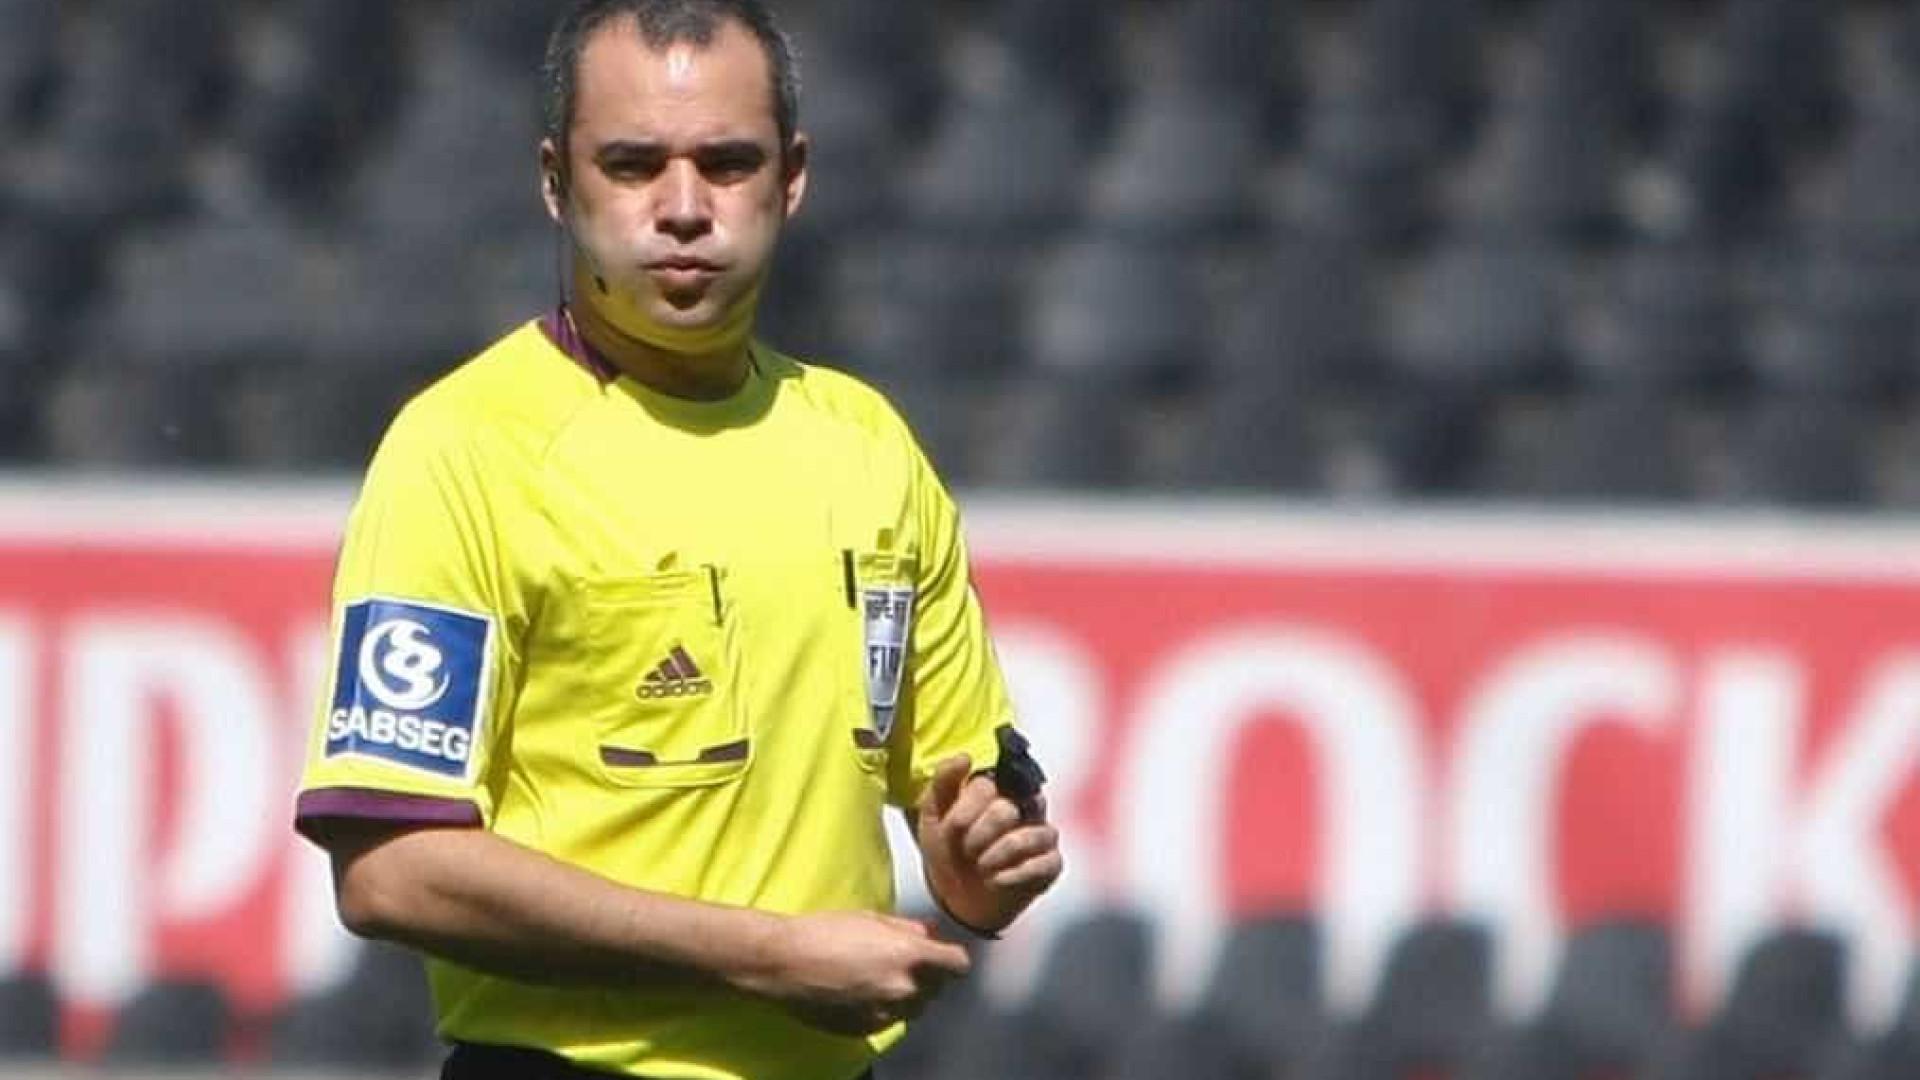 Arguido pesou na descida de Marco Ferreira. Ex-árbitro pede tempo